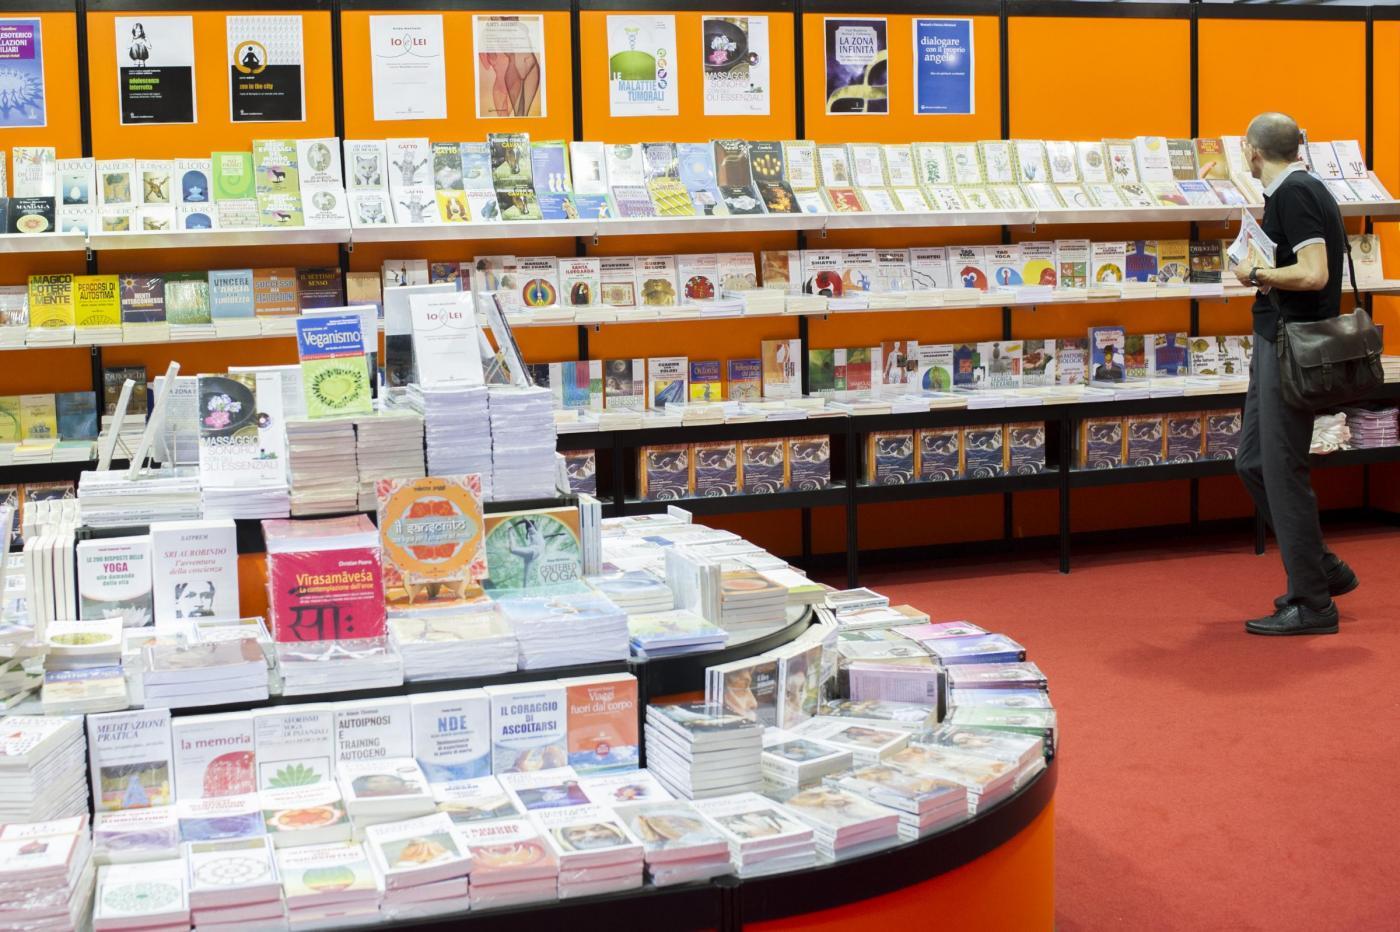 libri case editrici indipendenti